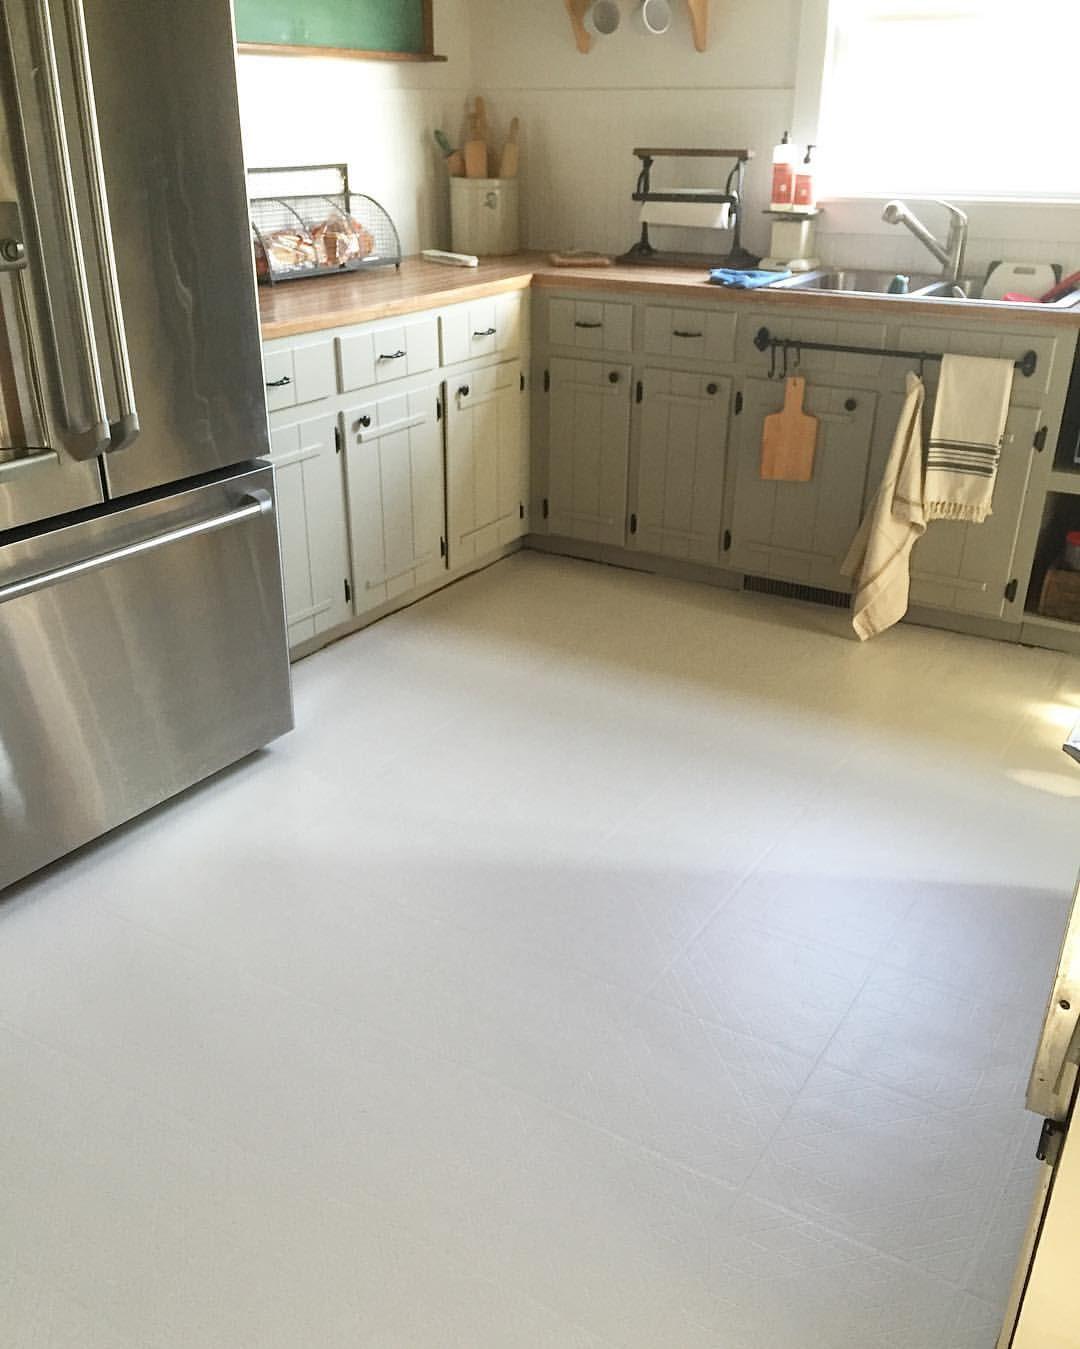 kitchen linoleum outdoor fridge painted floors farmhouse remodel little white house blog